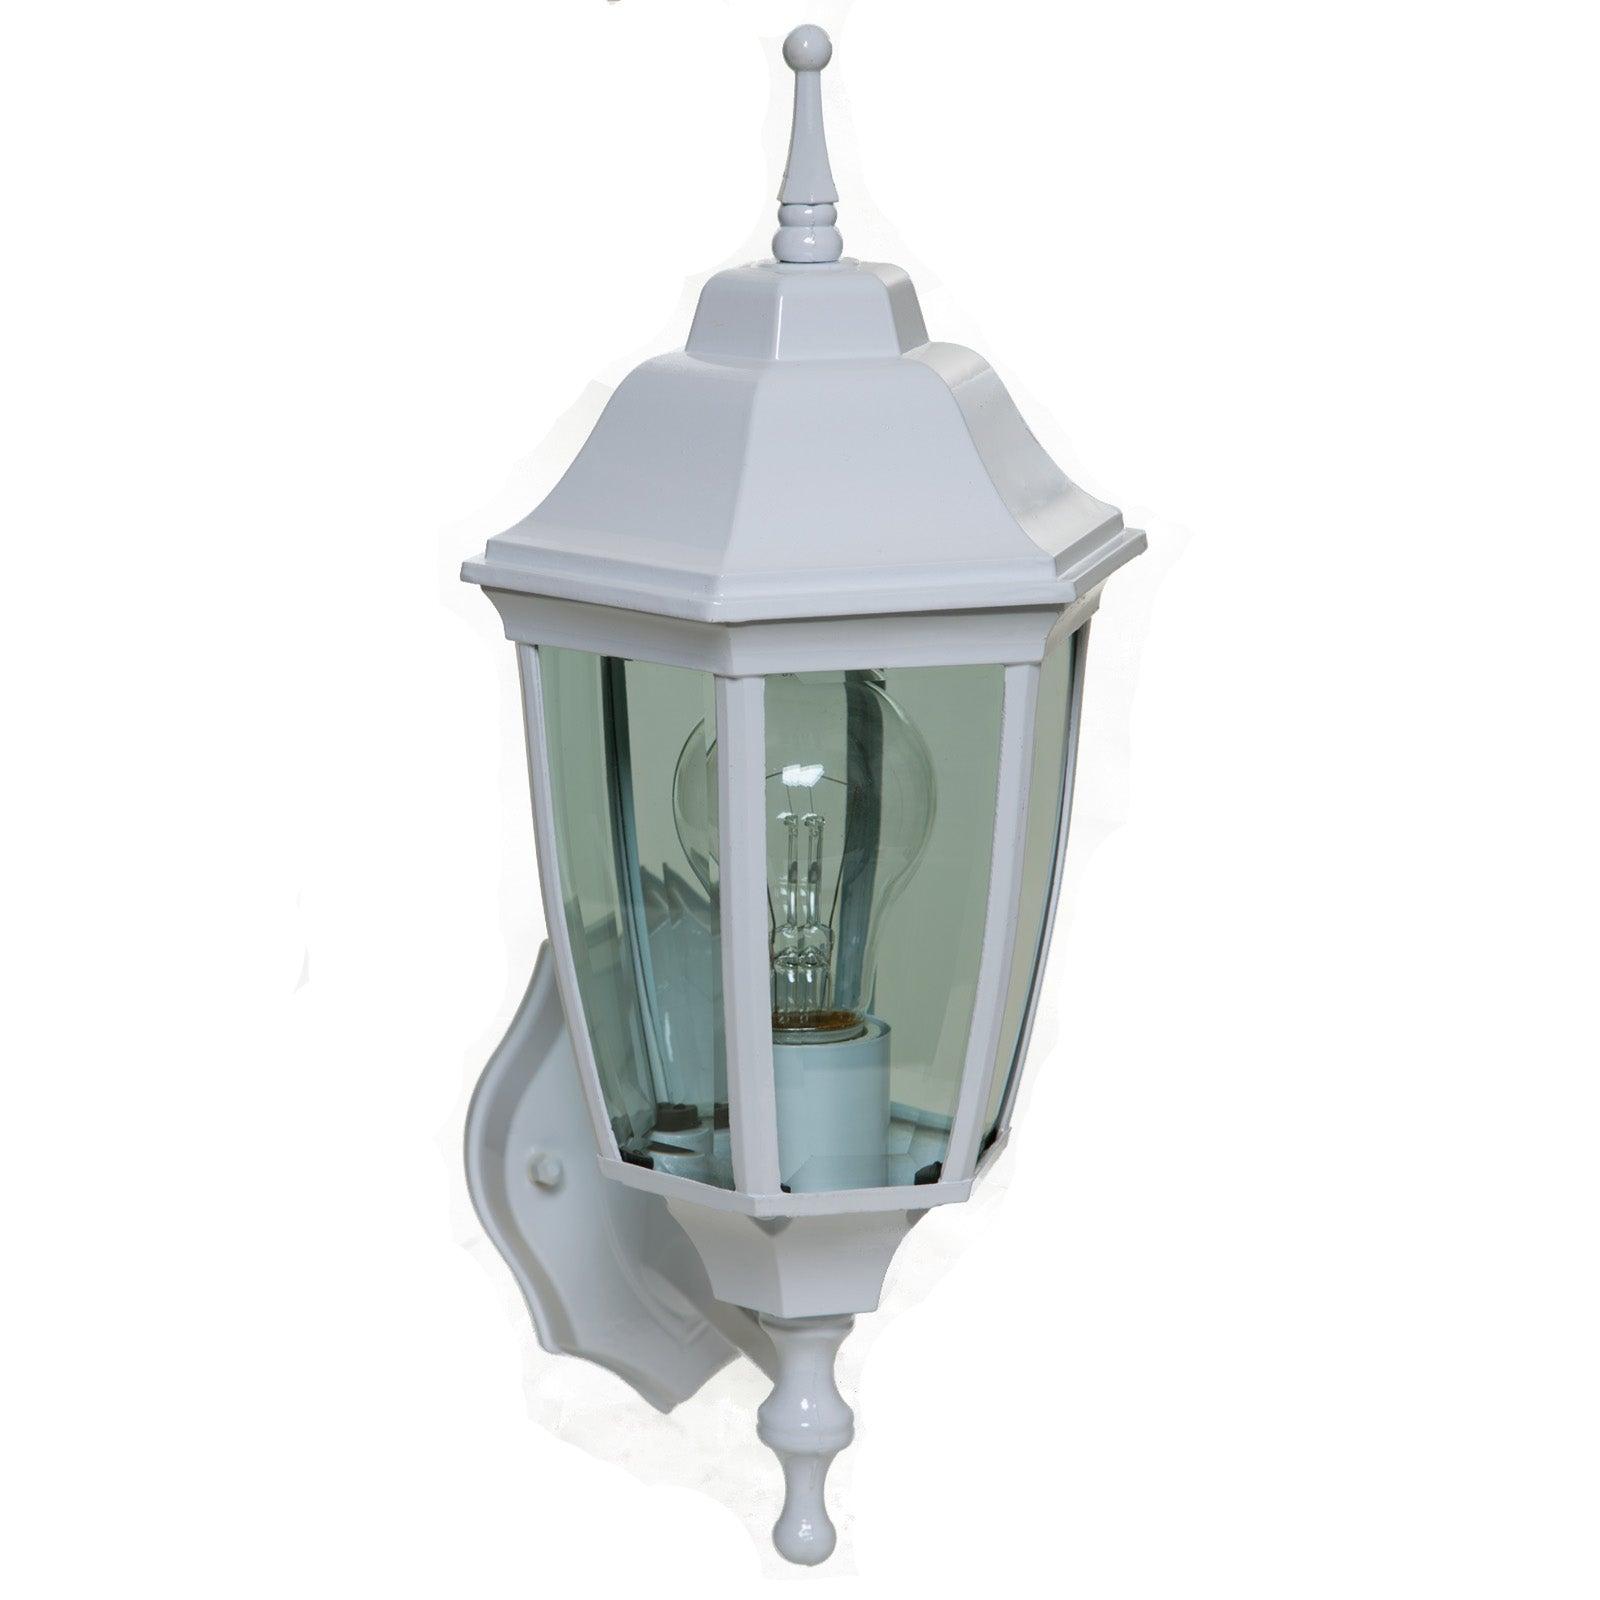 Boston Harbor Brt-bpp1611-wh3l Outdoor Porch Light Fixtures, White